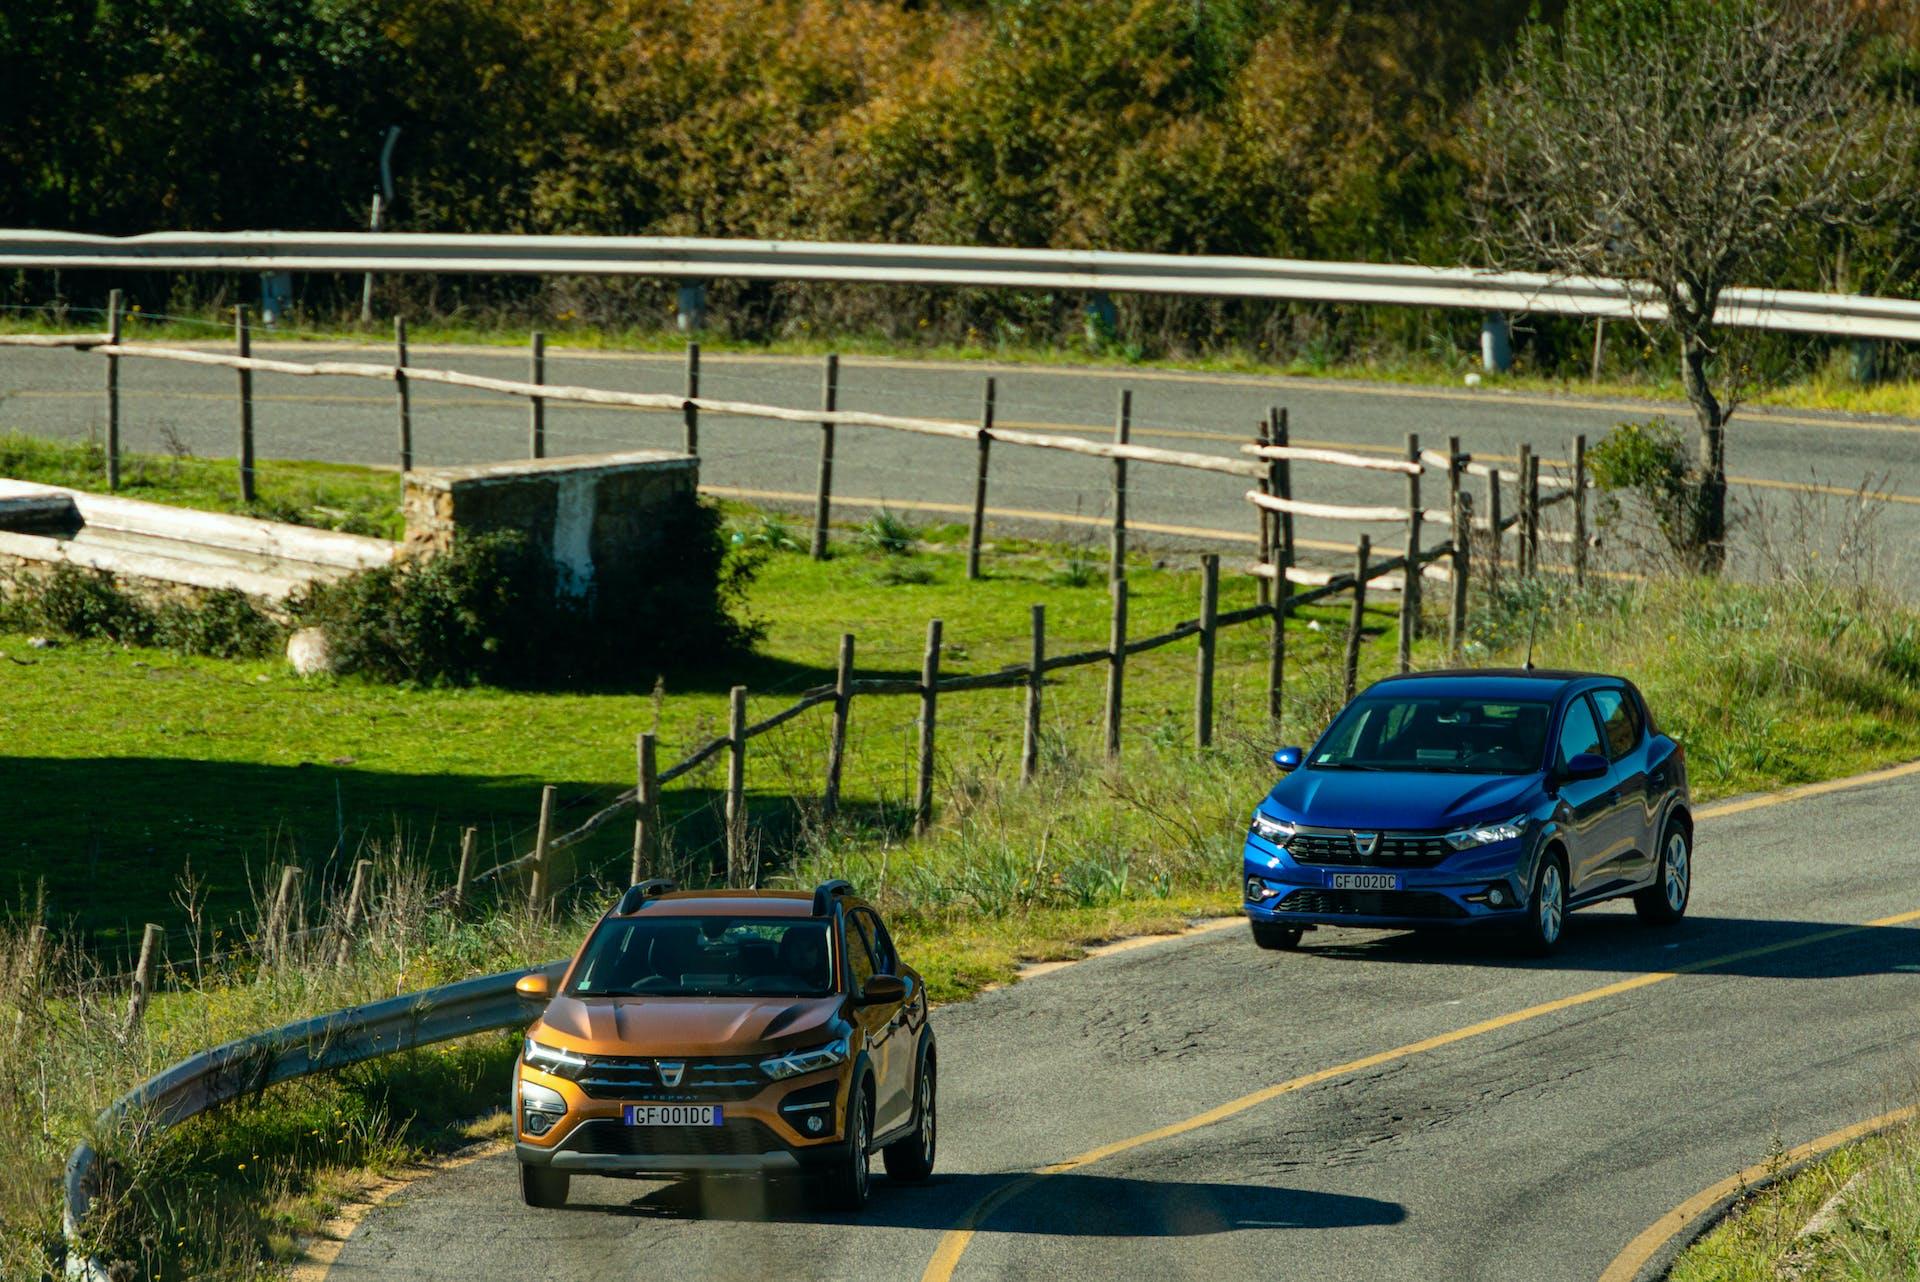 Prova nuova Dacia Sandero Stepway e Streetway